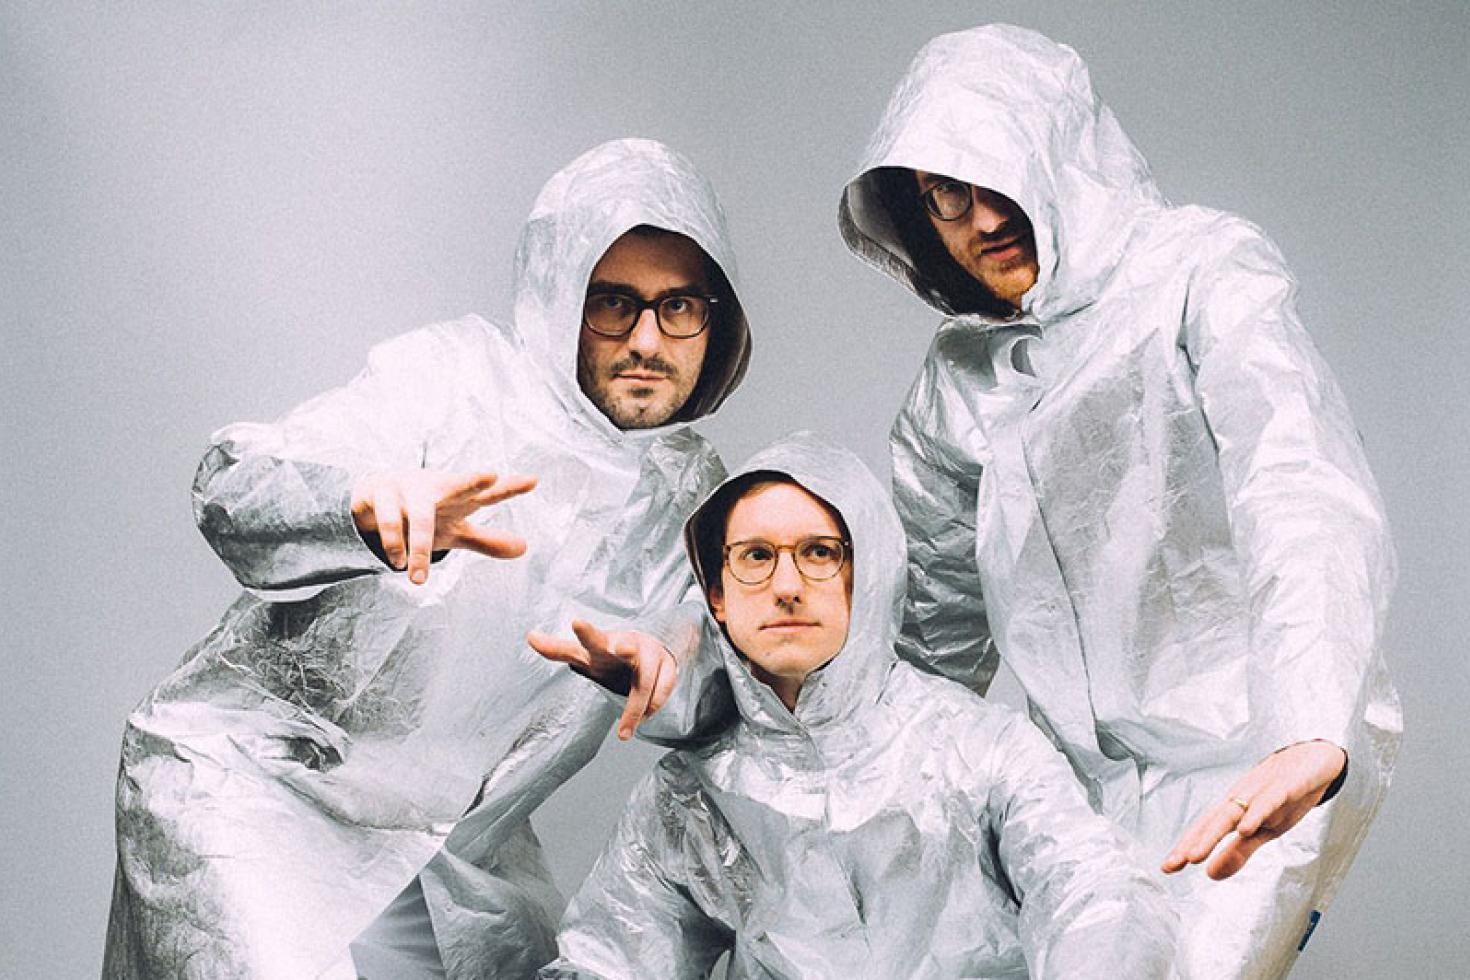 Pet Symmetry shares loungey new single 'Pet Sympathy'